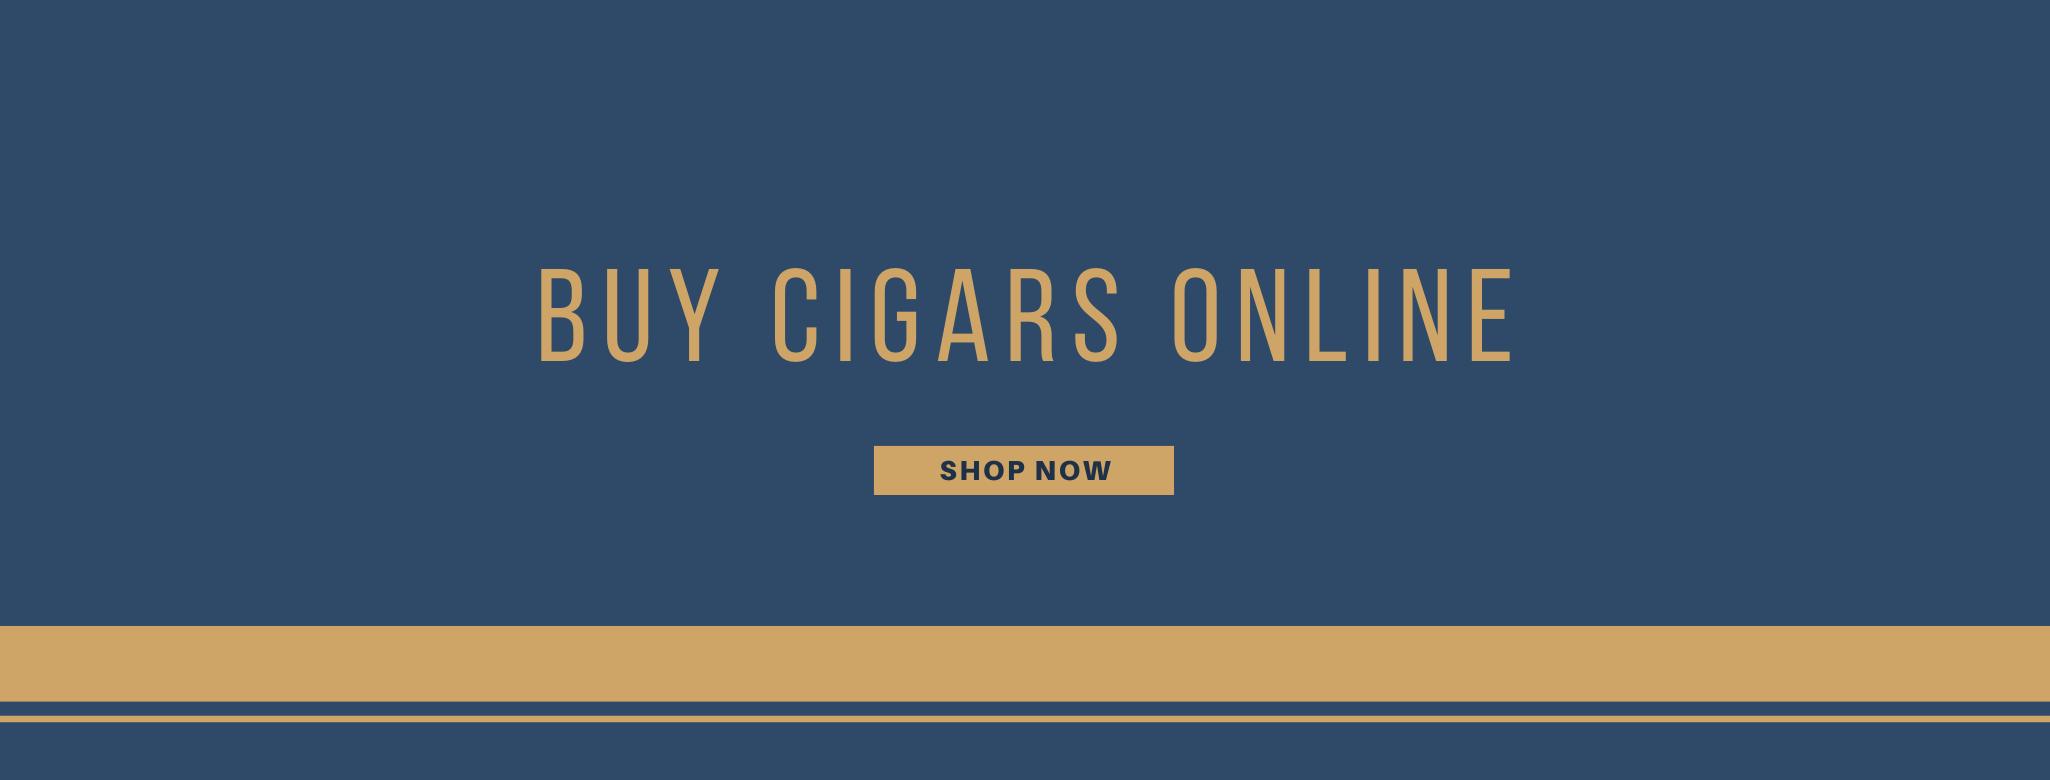 Buy cigars online banner